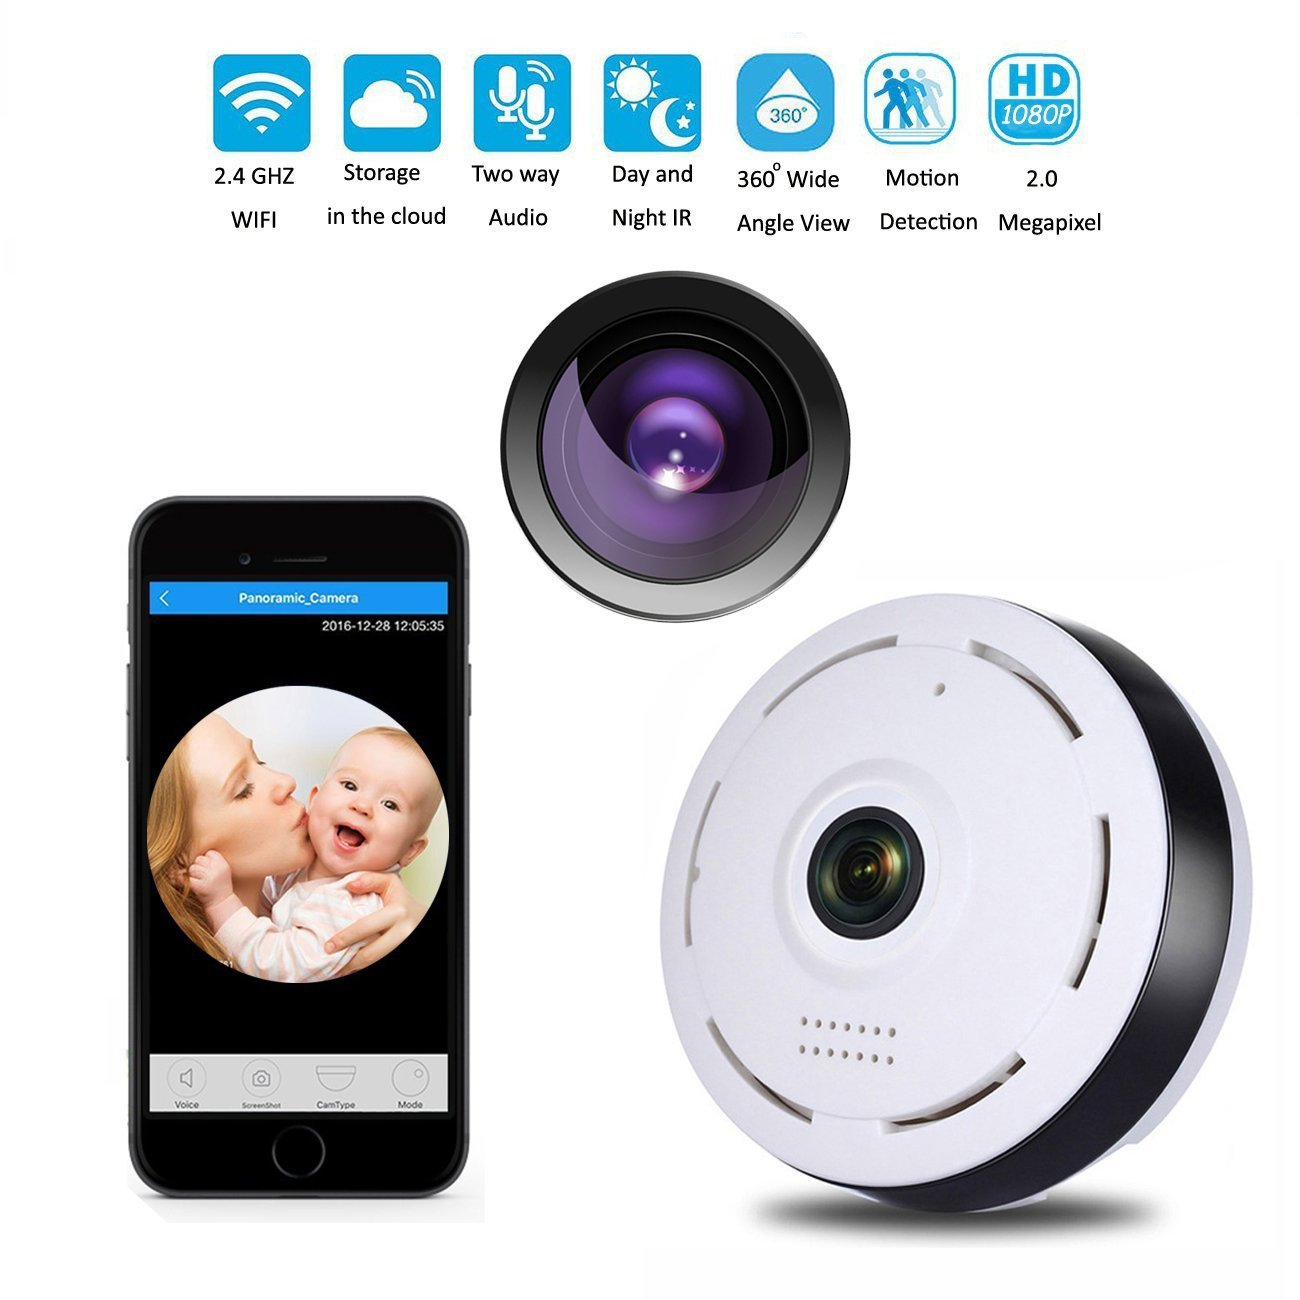 WiFi Wireless Panoramic Camera HD 360 Degree Night Vision Fisheye Security Camera white_EU plug